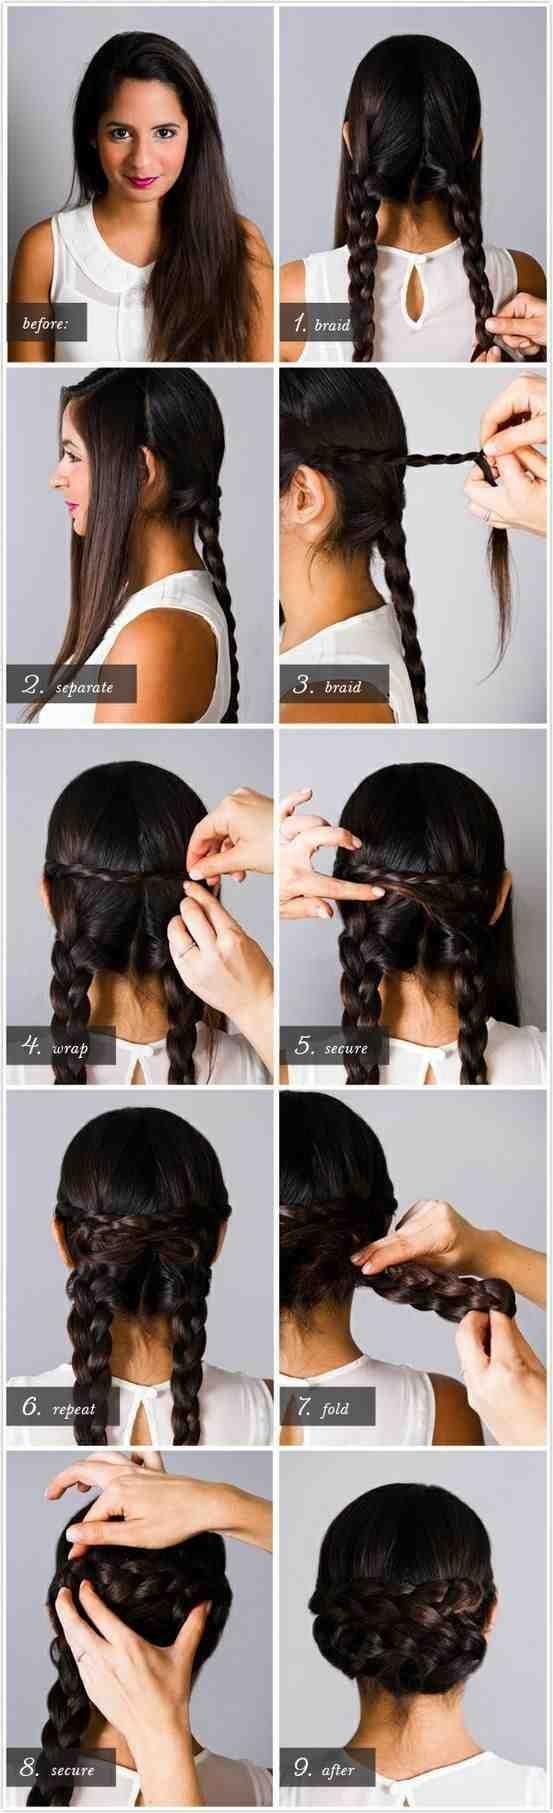 DIY Braided Hair diy long hair hair ideas diy ideas easy diy diy beauty diy hair diy fashion beauty diy diy style diy braid hairstyles diy hair style hair tutorials